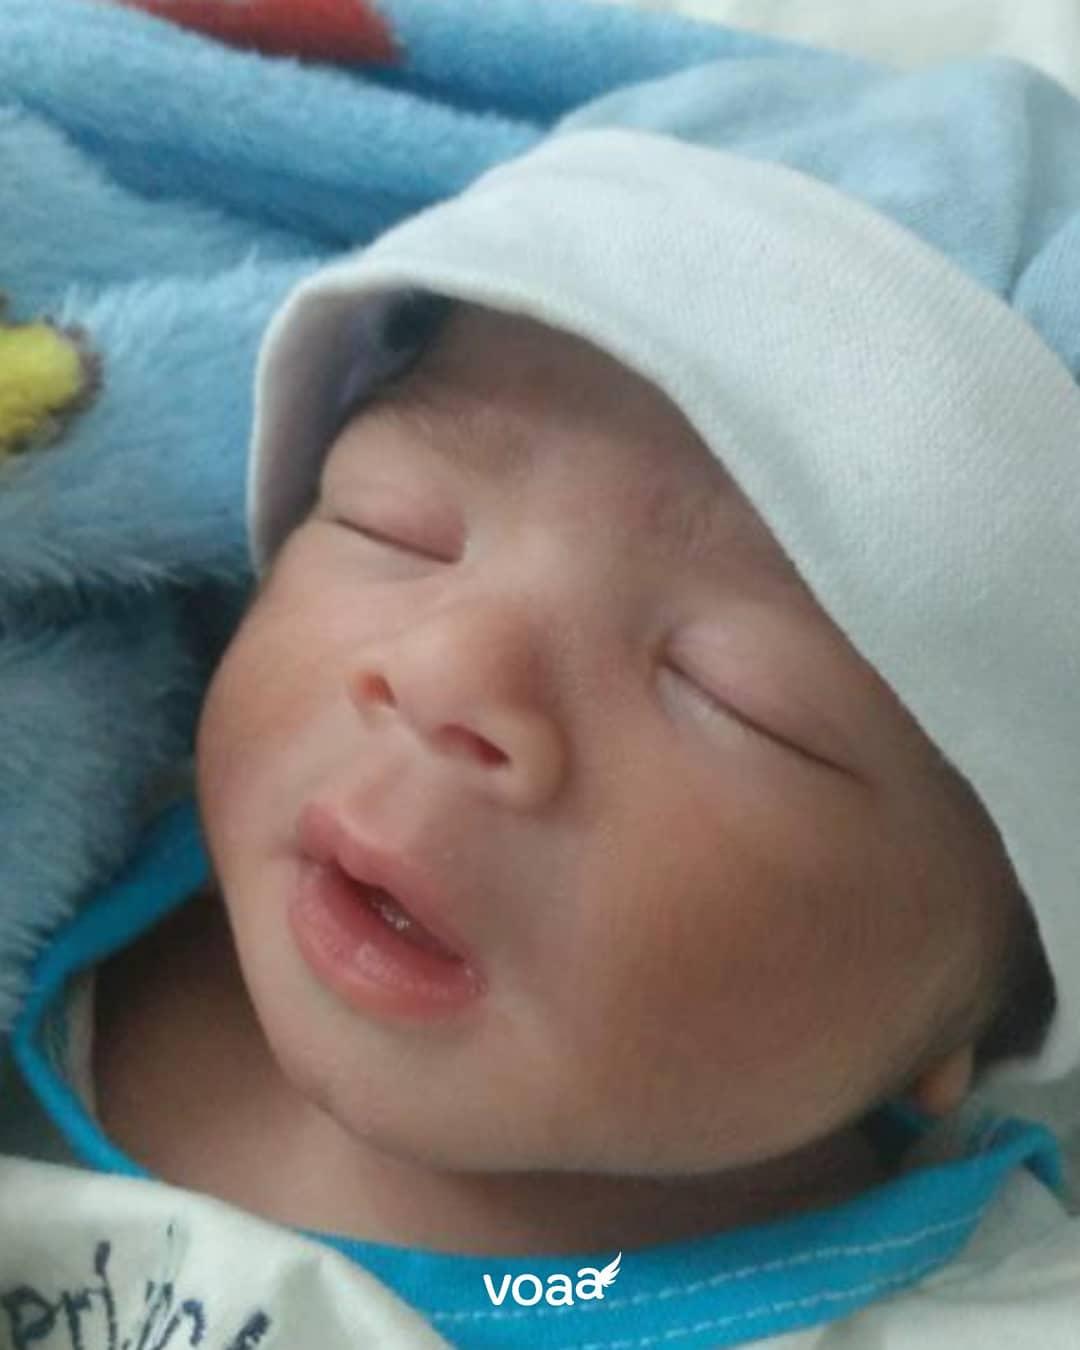 voaa jovem adotou bebê deficiência dá à luz menino